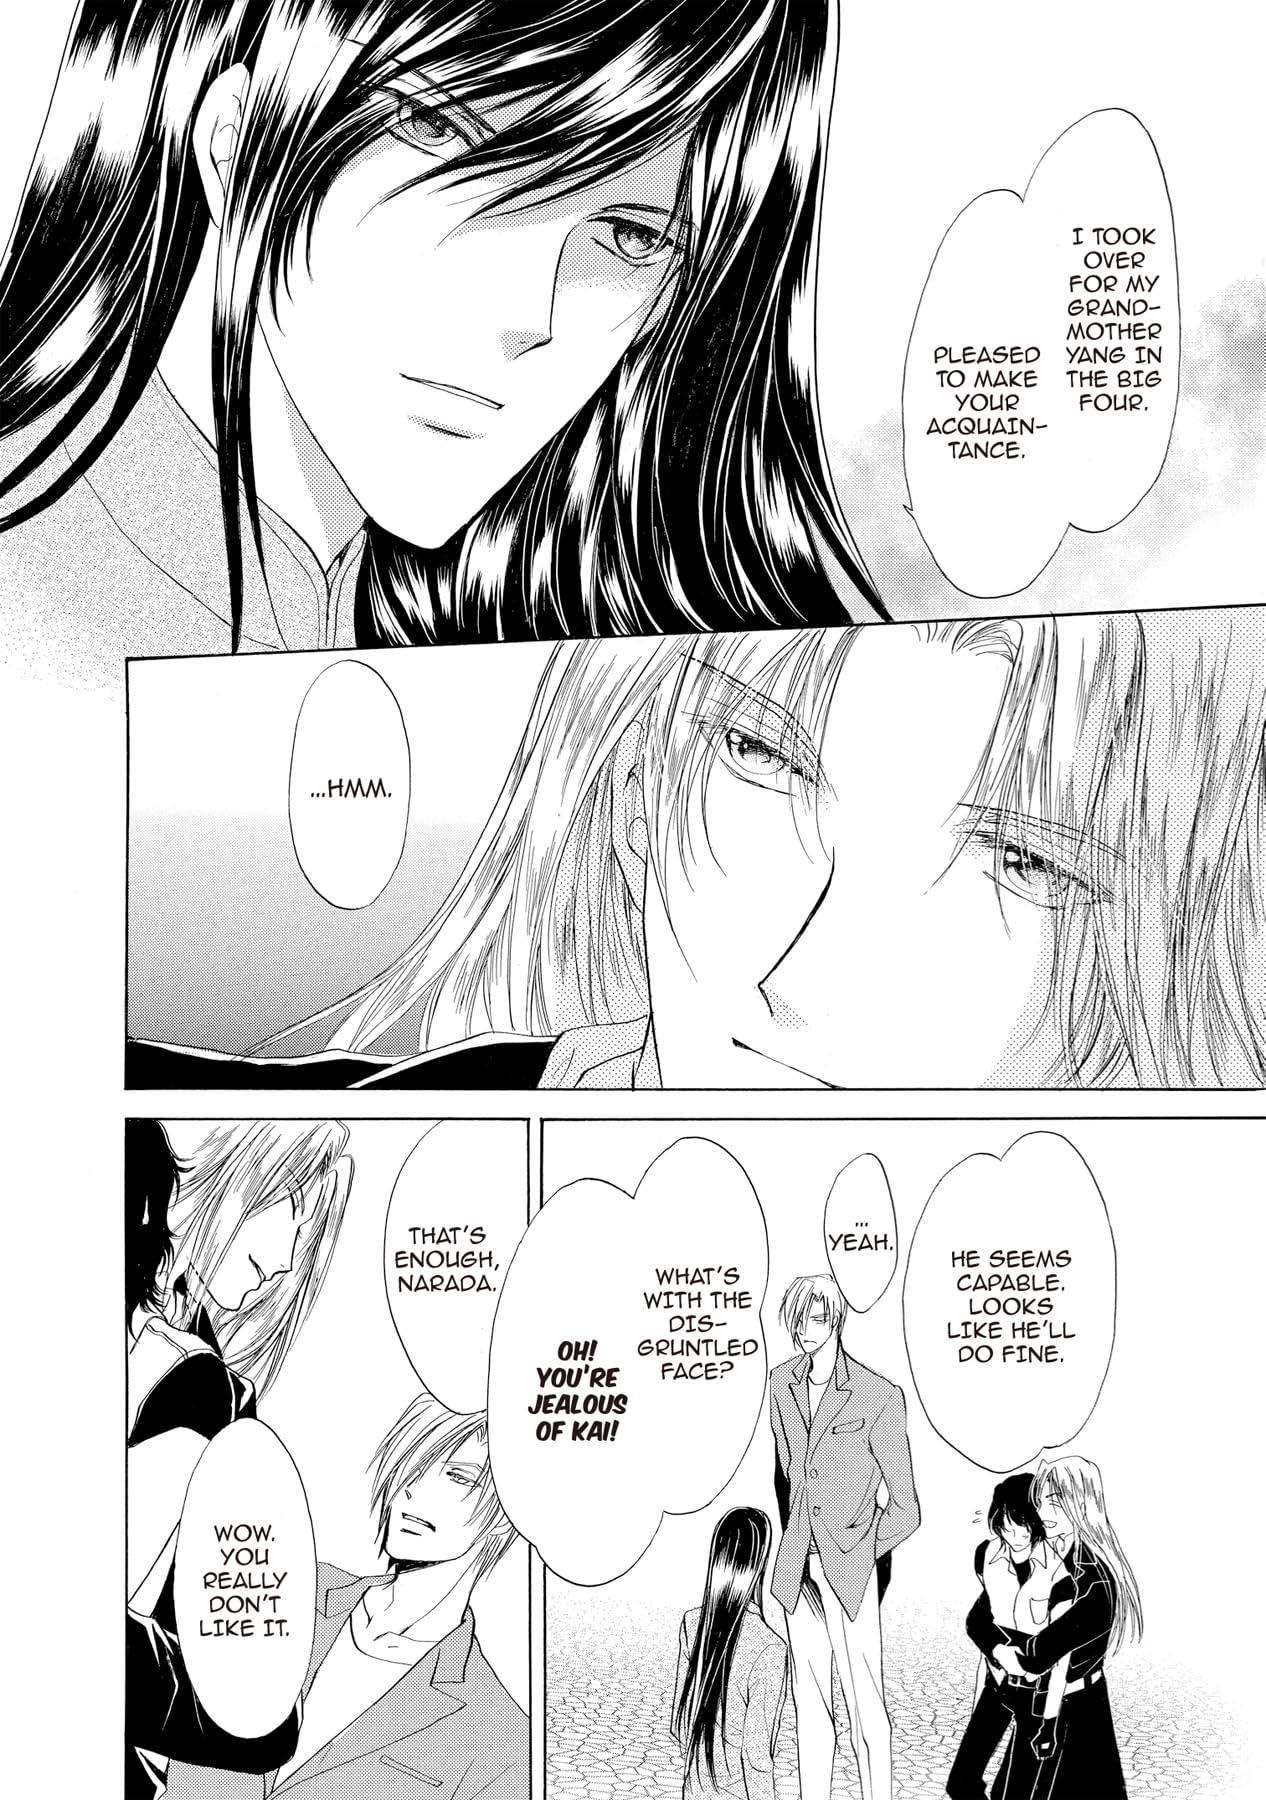 BLUE SHEEP'S REVERIE  (Yaoi Manga) Vol. 7